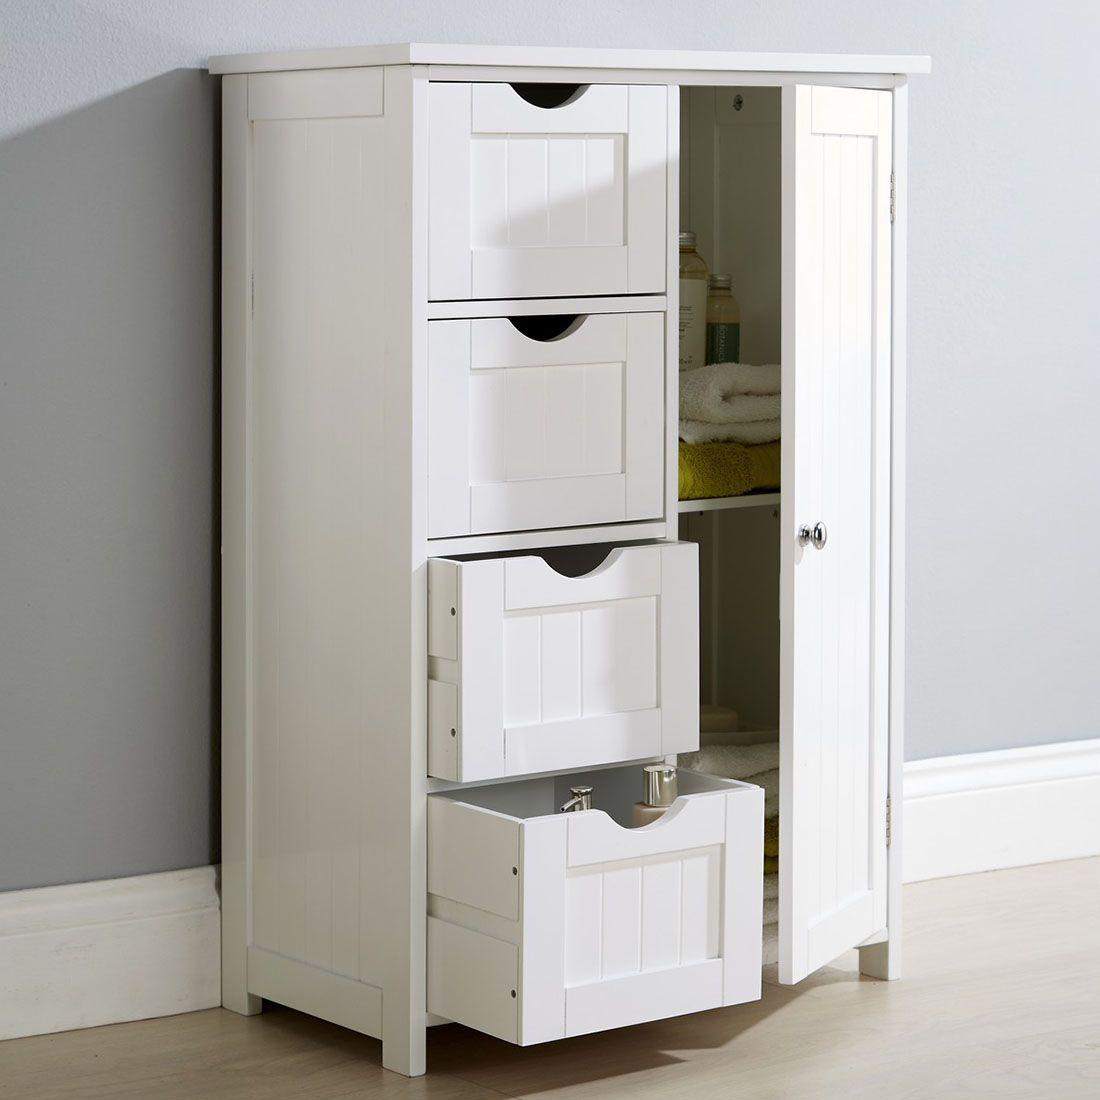 Shaker door drawer bathroom unit u next day delivery shaker